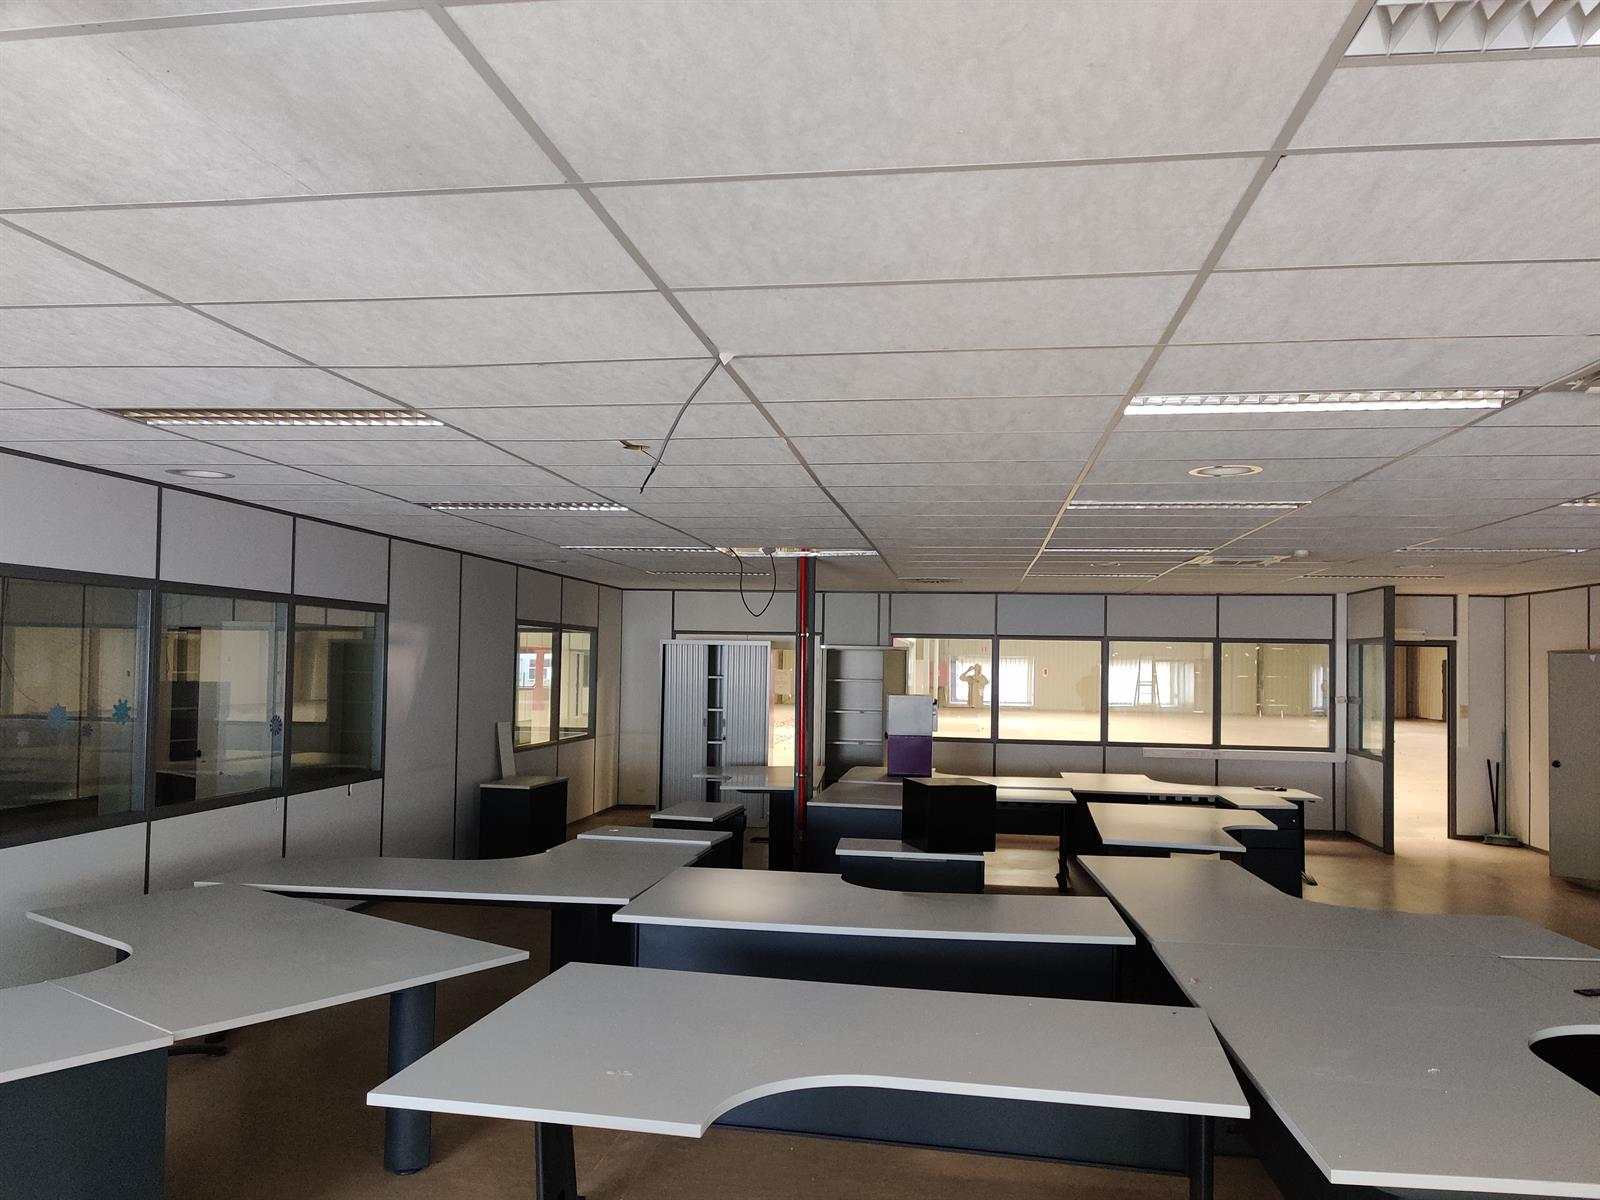 gebouw voor gemengd gebruik te huur I173 - Quatrieme Rue , 6040 Charleroi Jumet, België 25